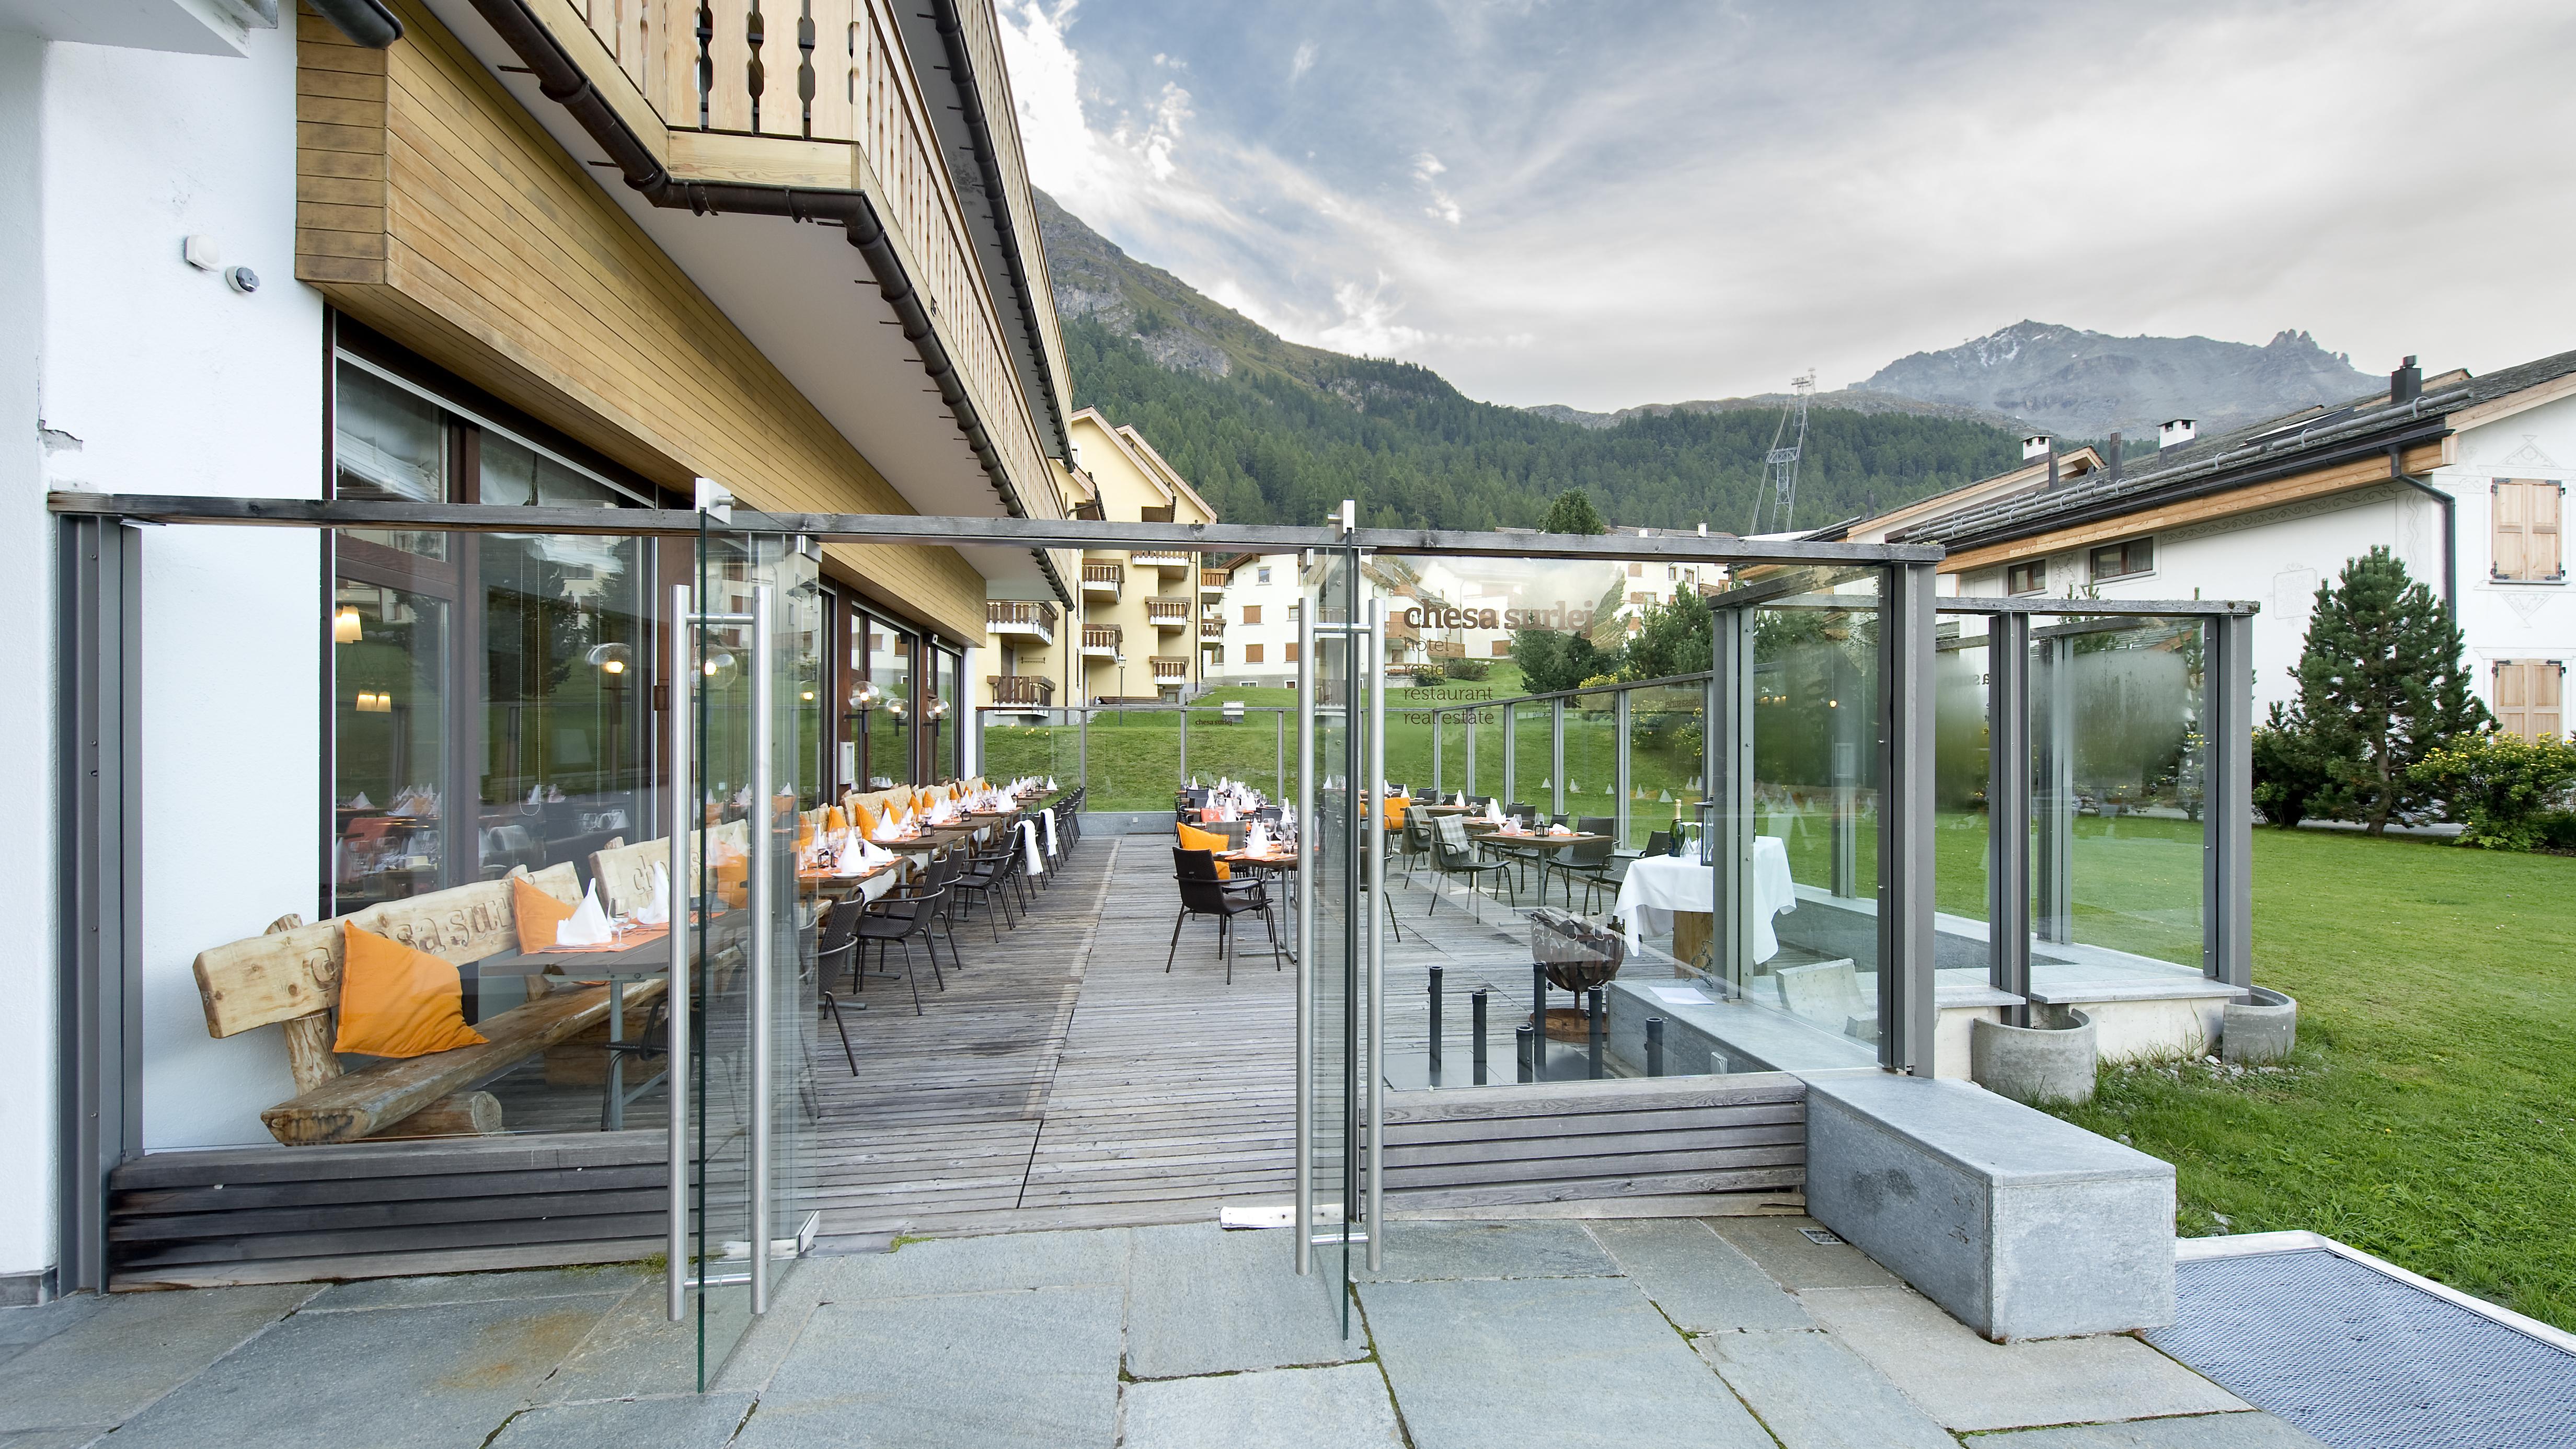 Restaurant LaBrasera Slide 3